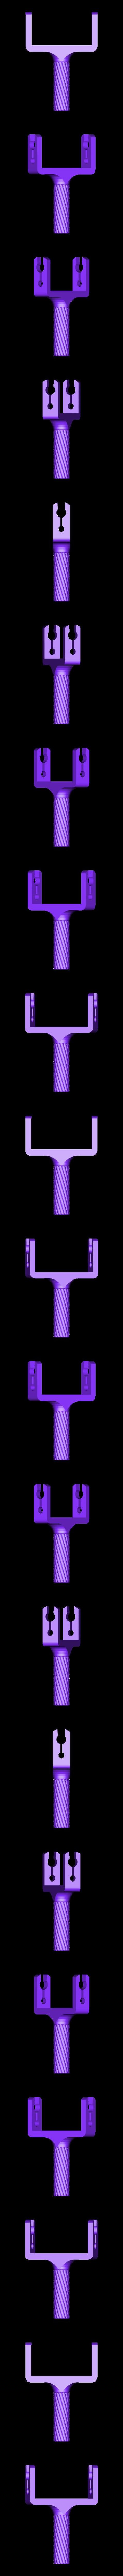 Raczka_2.stl Download free STL file Massage tool (+v2) • 3D printing design, kpawel